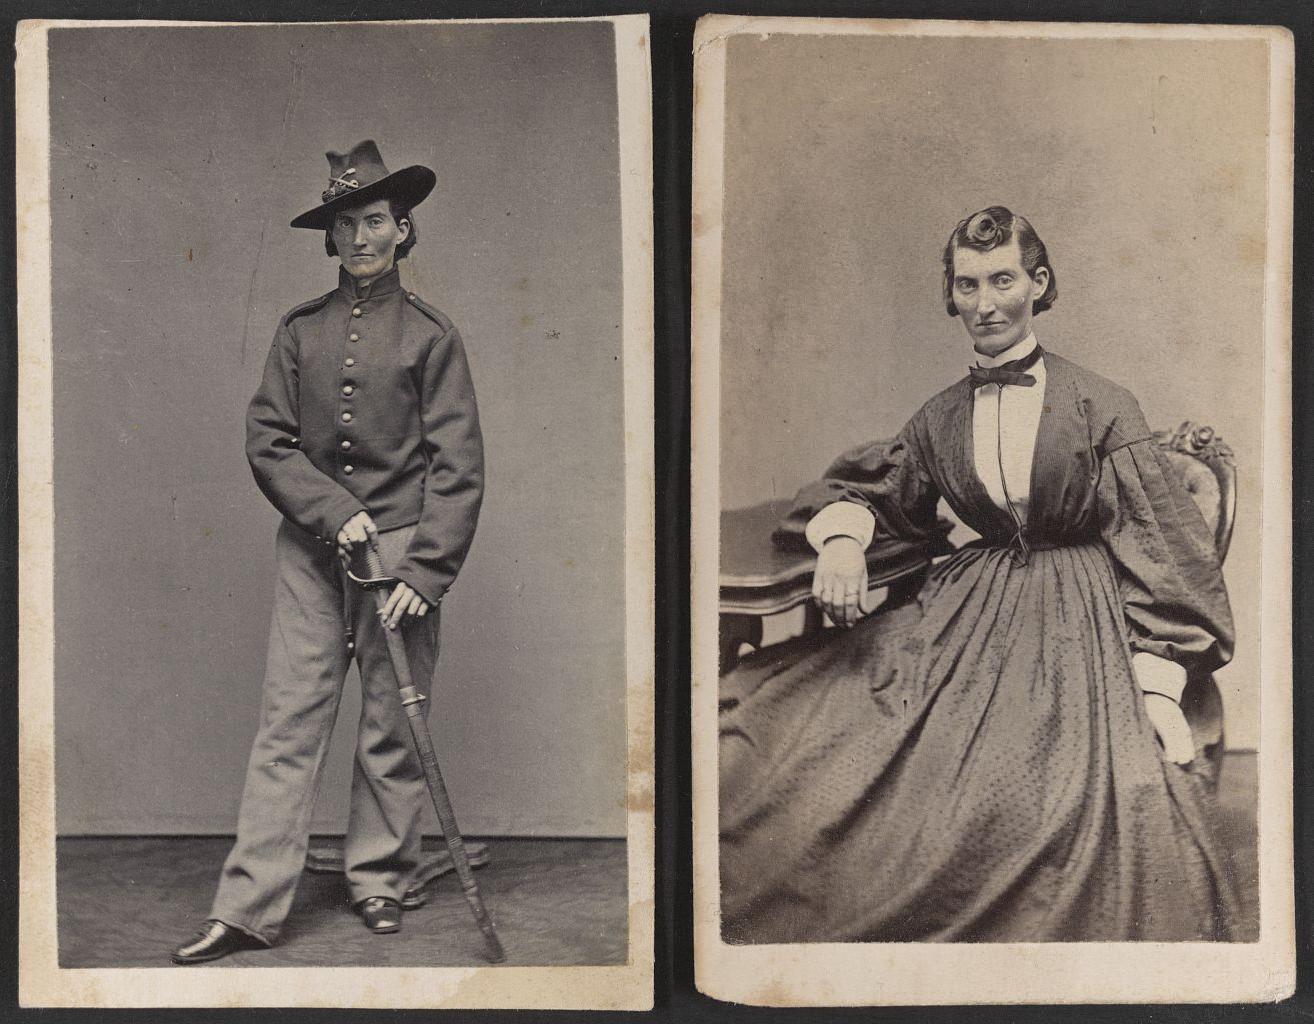 Vintage: Frances Louisa Clayton (19th Century)